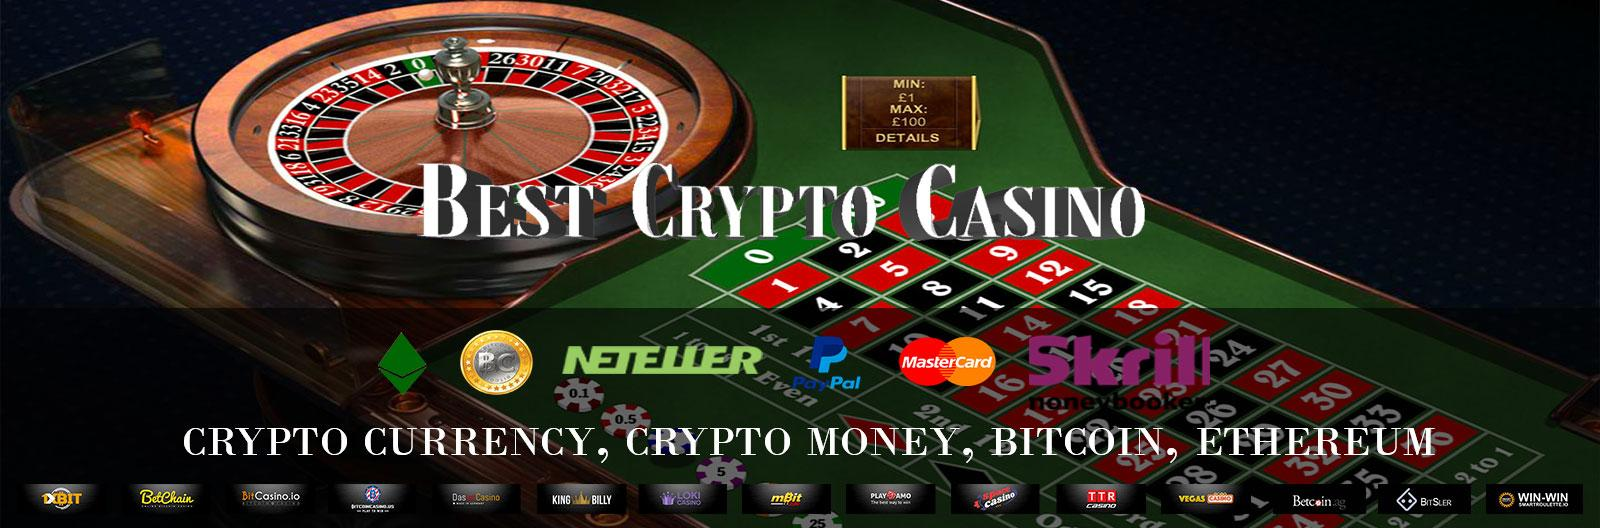 Bitcoin casino 888 android